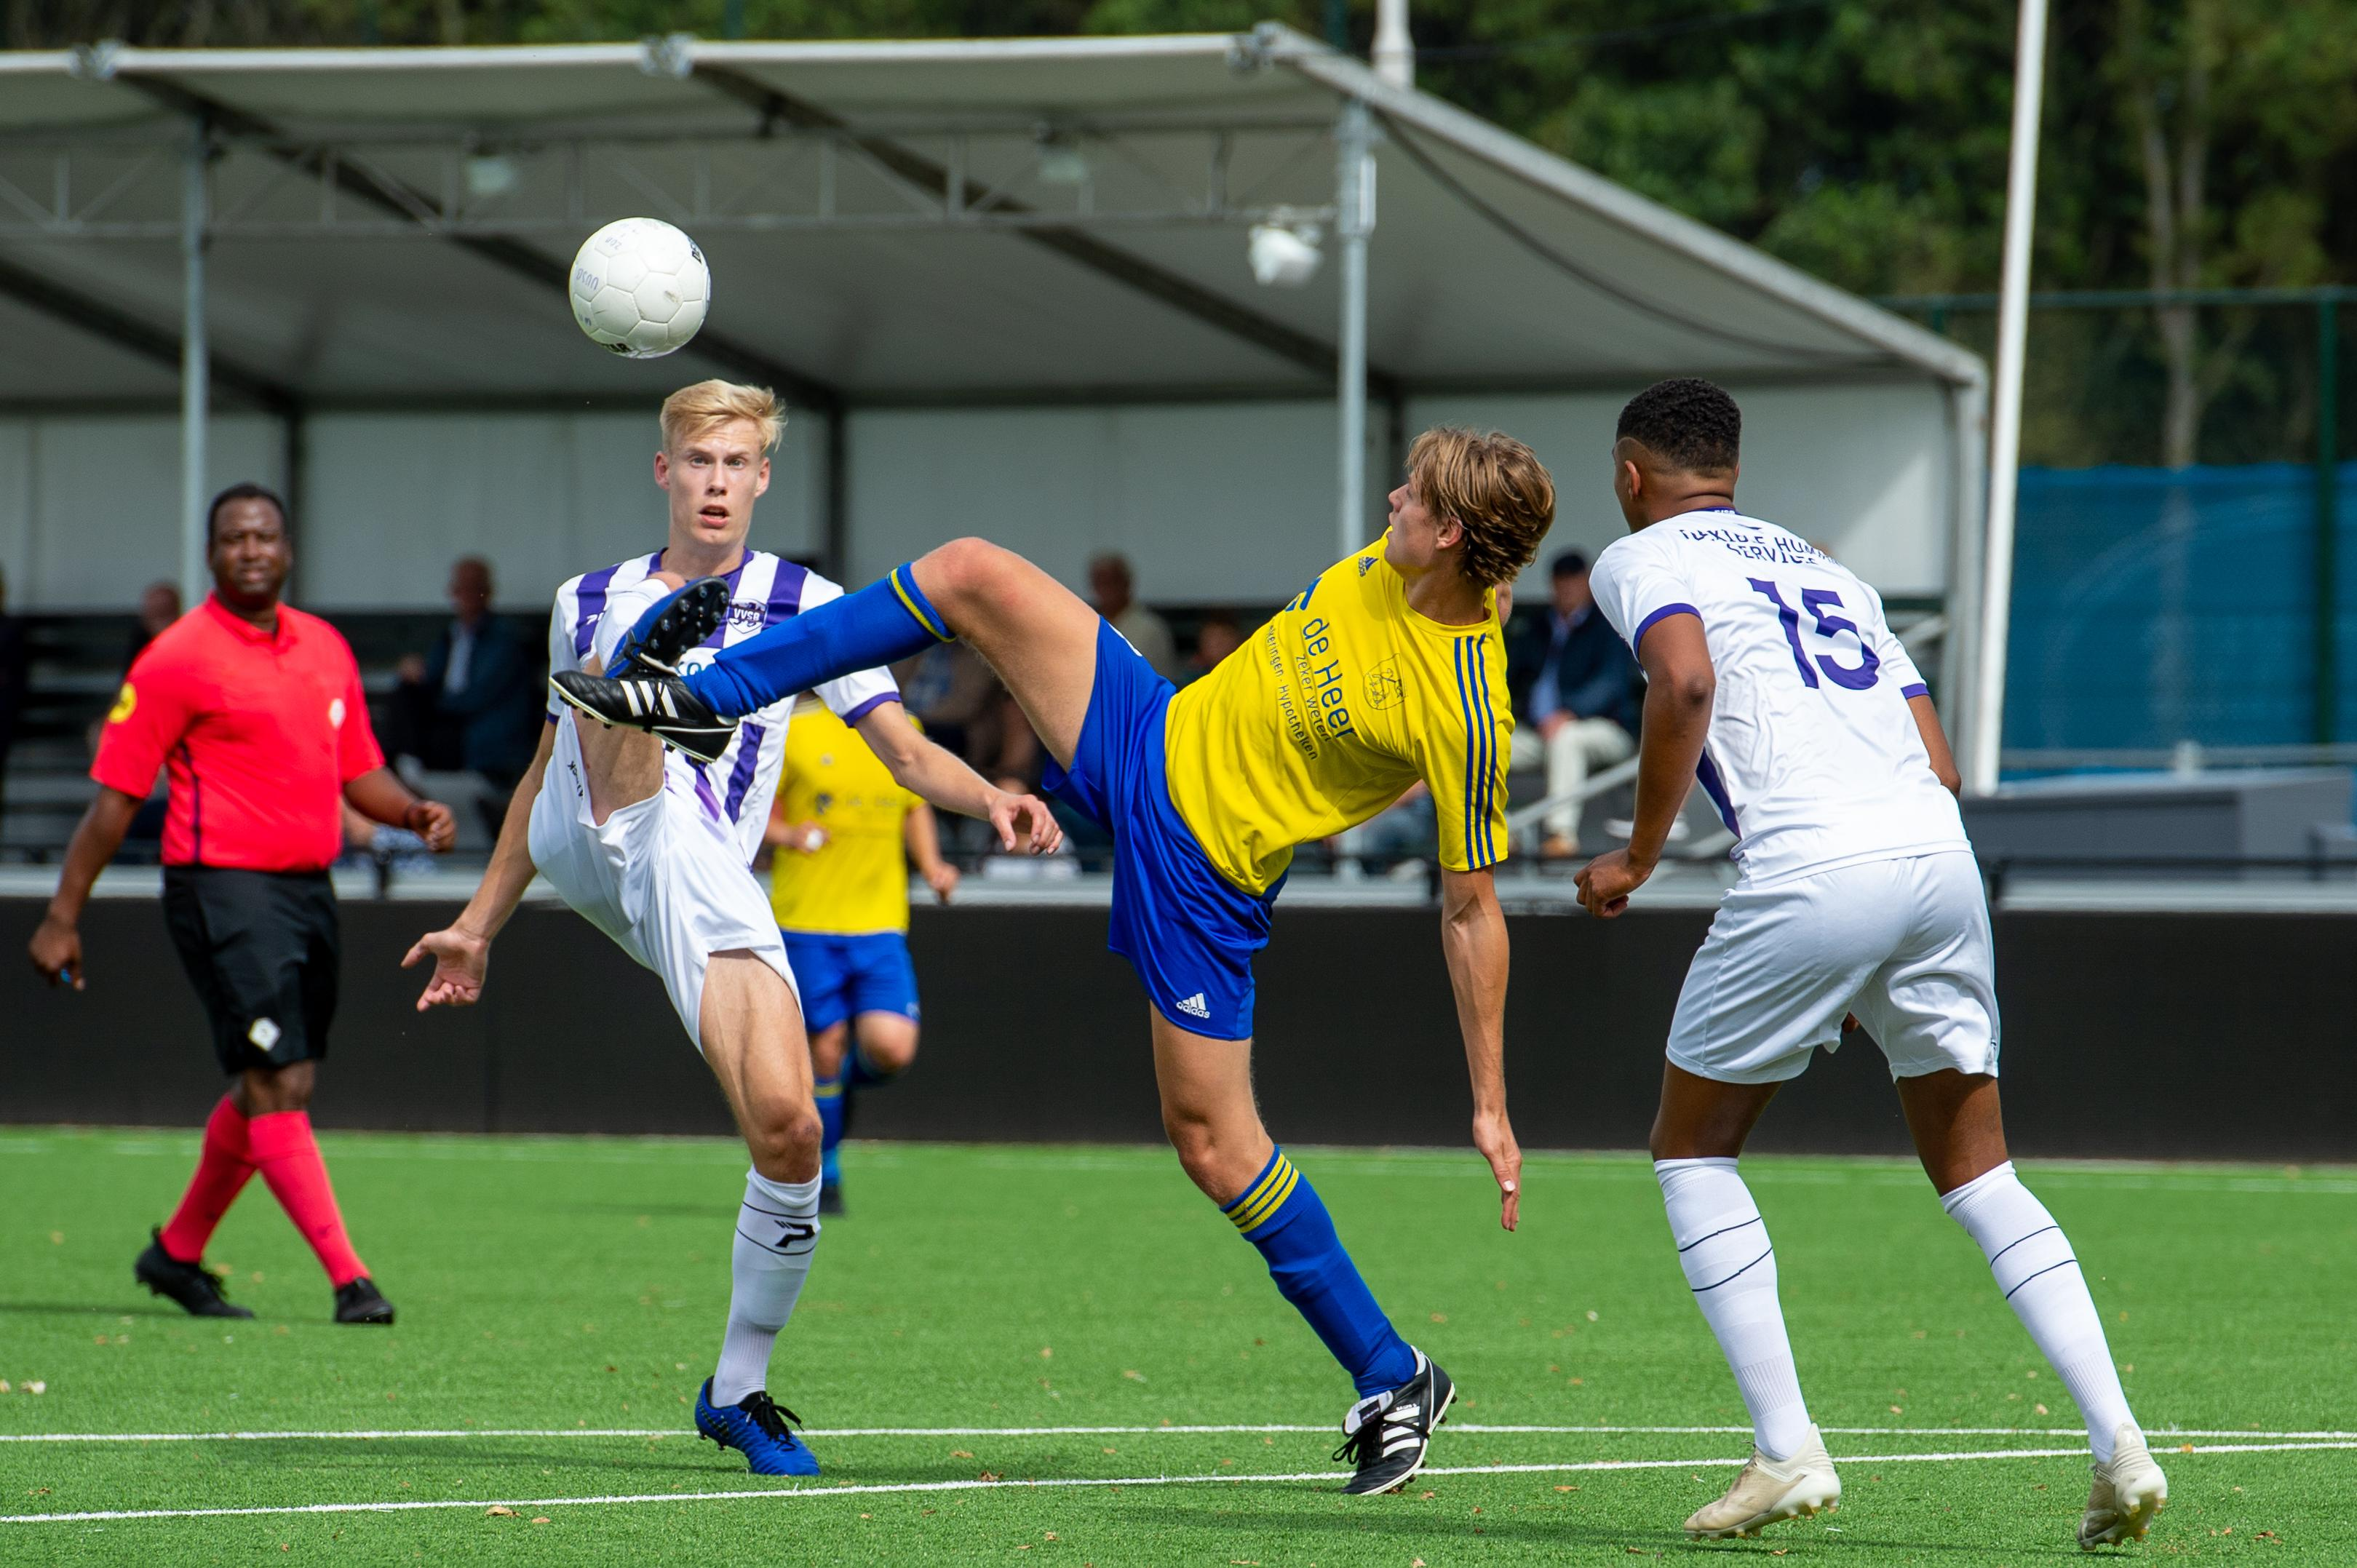 Stevige voorbereiding hoofdklasser Velsen met louter sterke opponenten, meer opties voor nieuwe trainer Jan Nederburgh